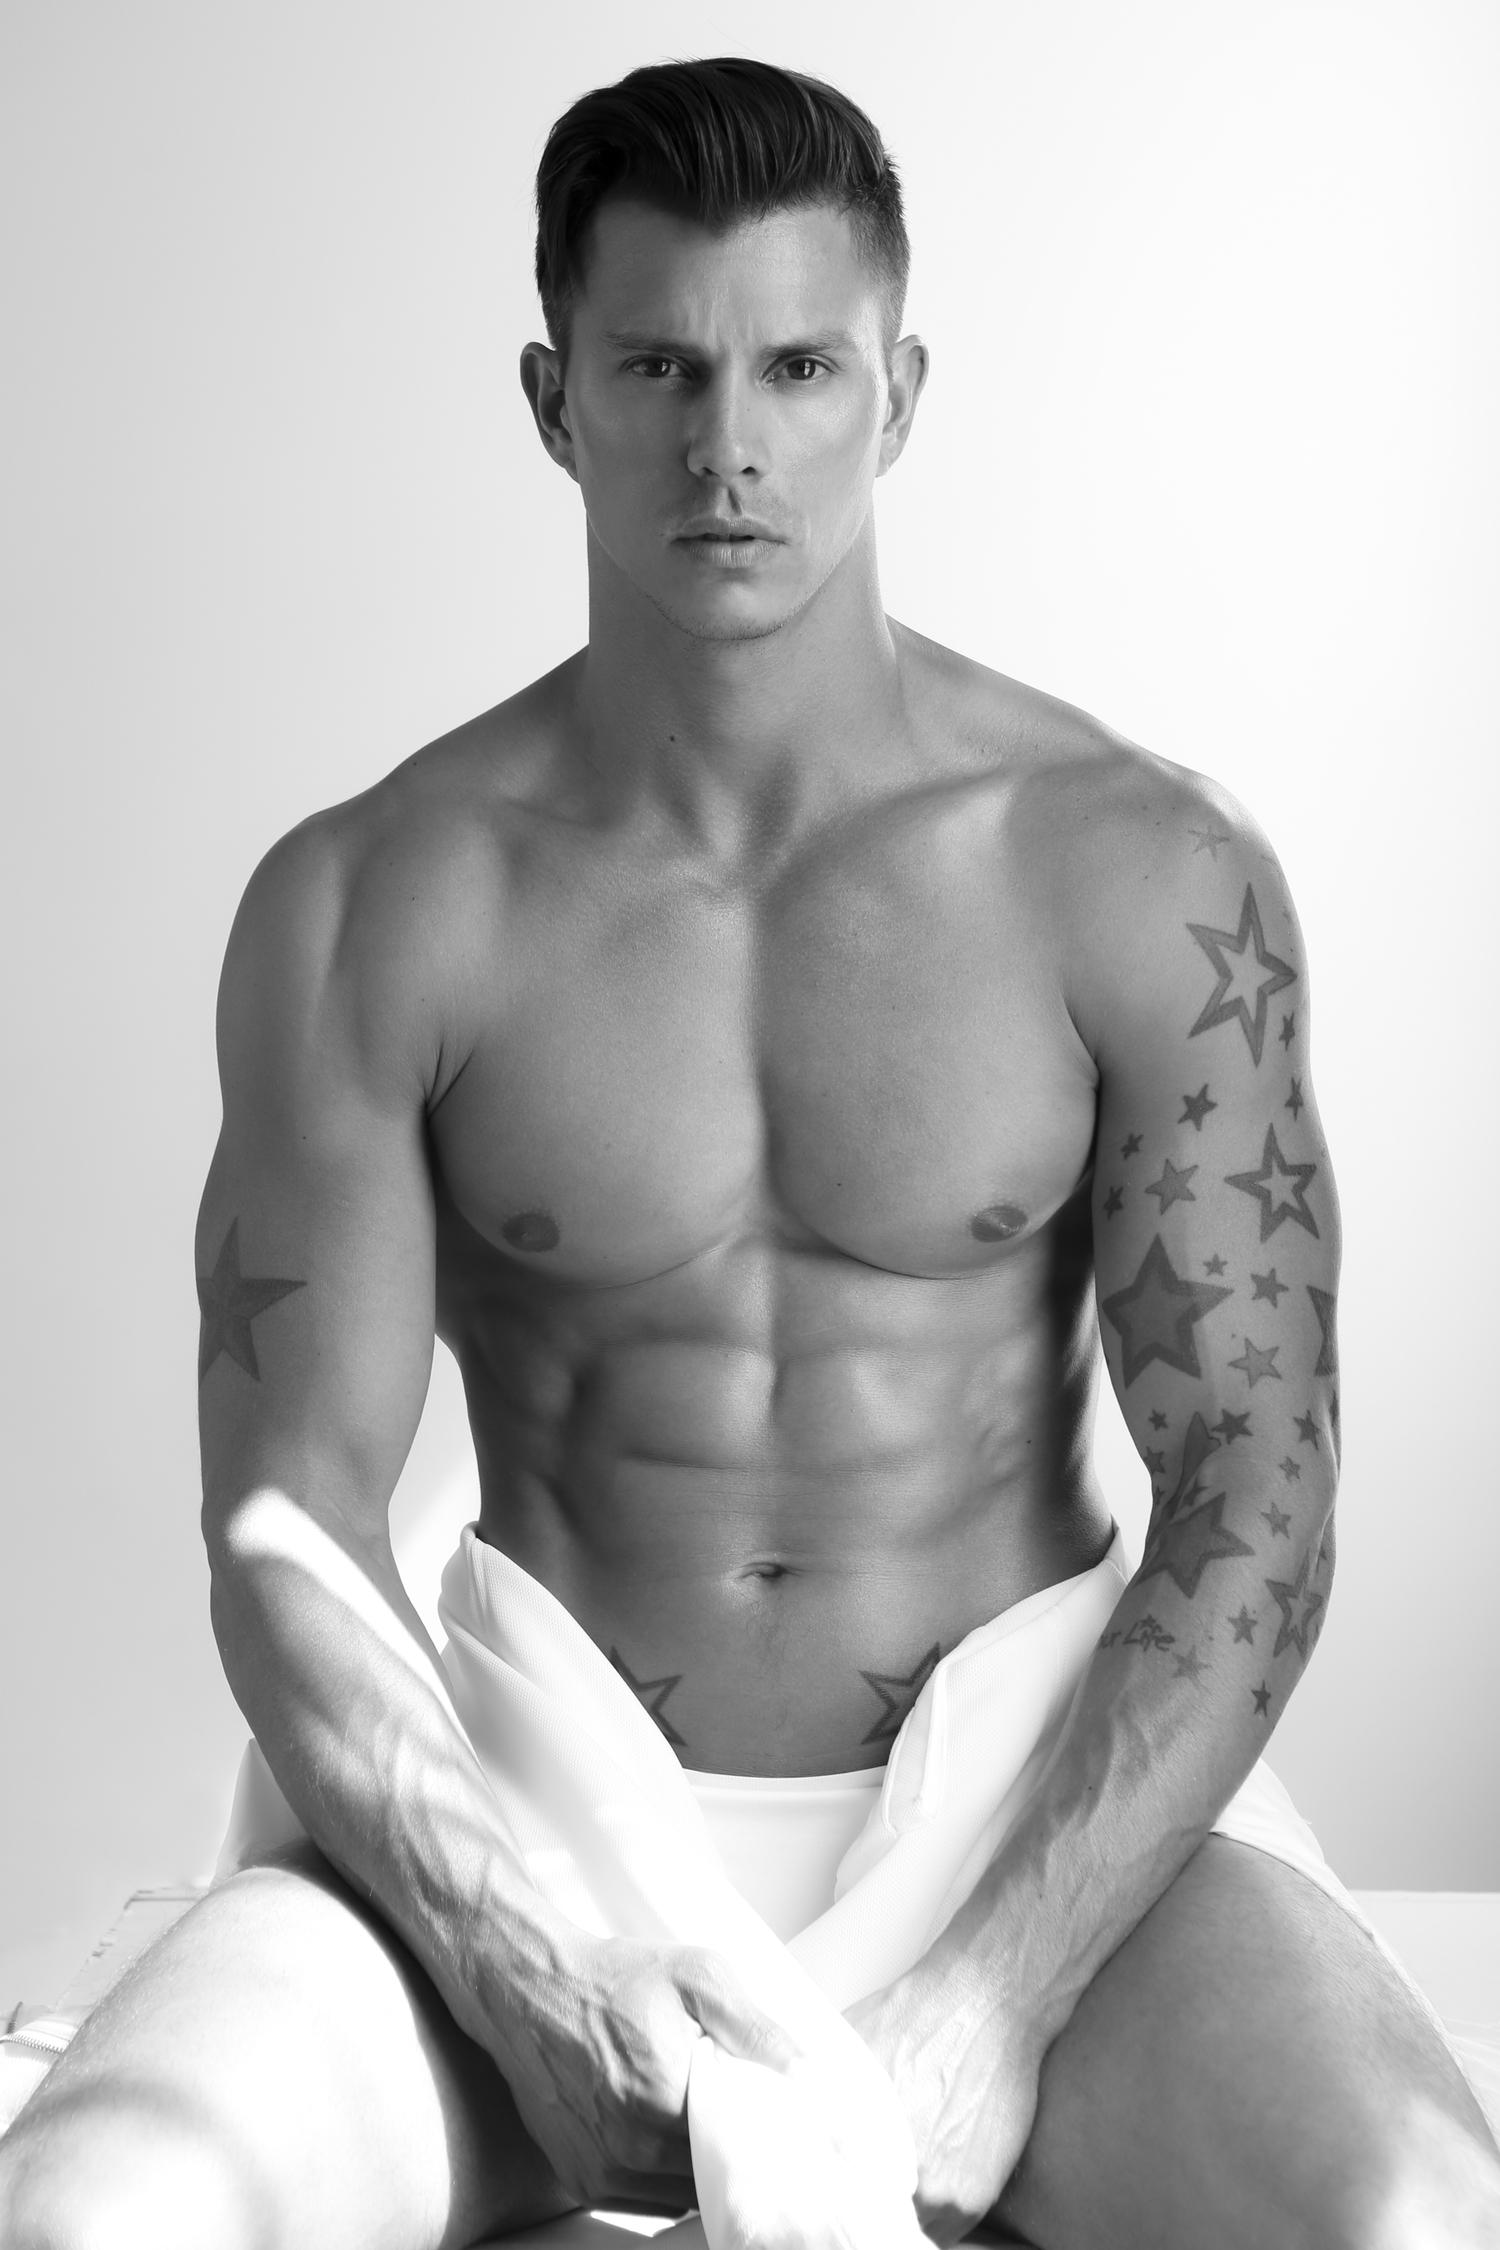 Adon Exclusive: Model Kenny Braasch By Michael Dar